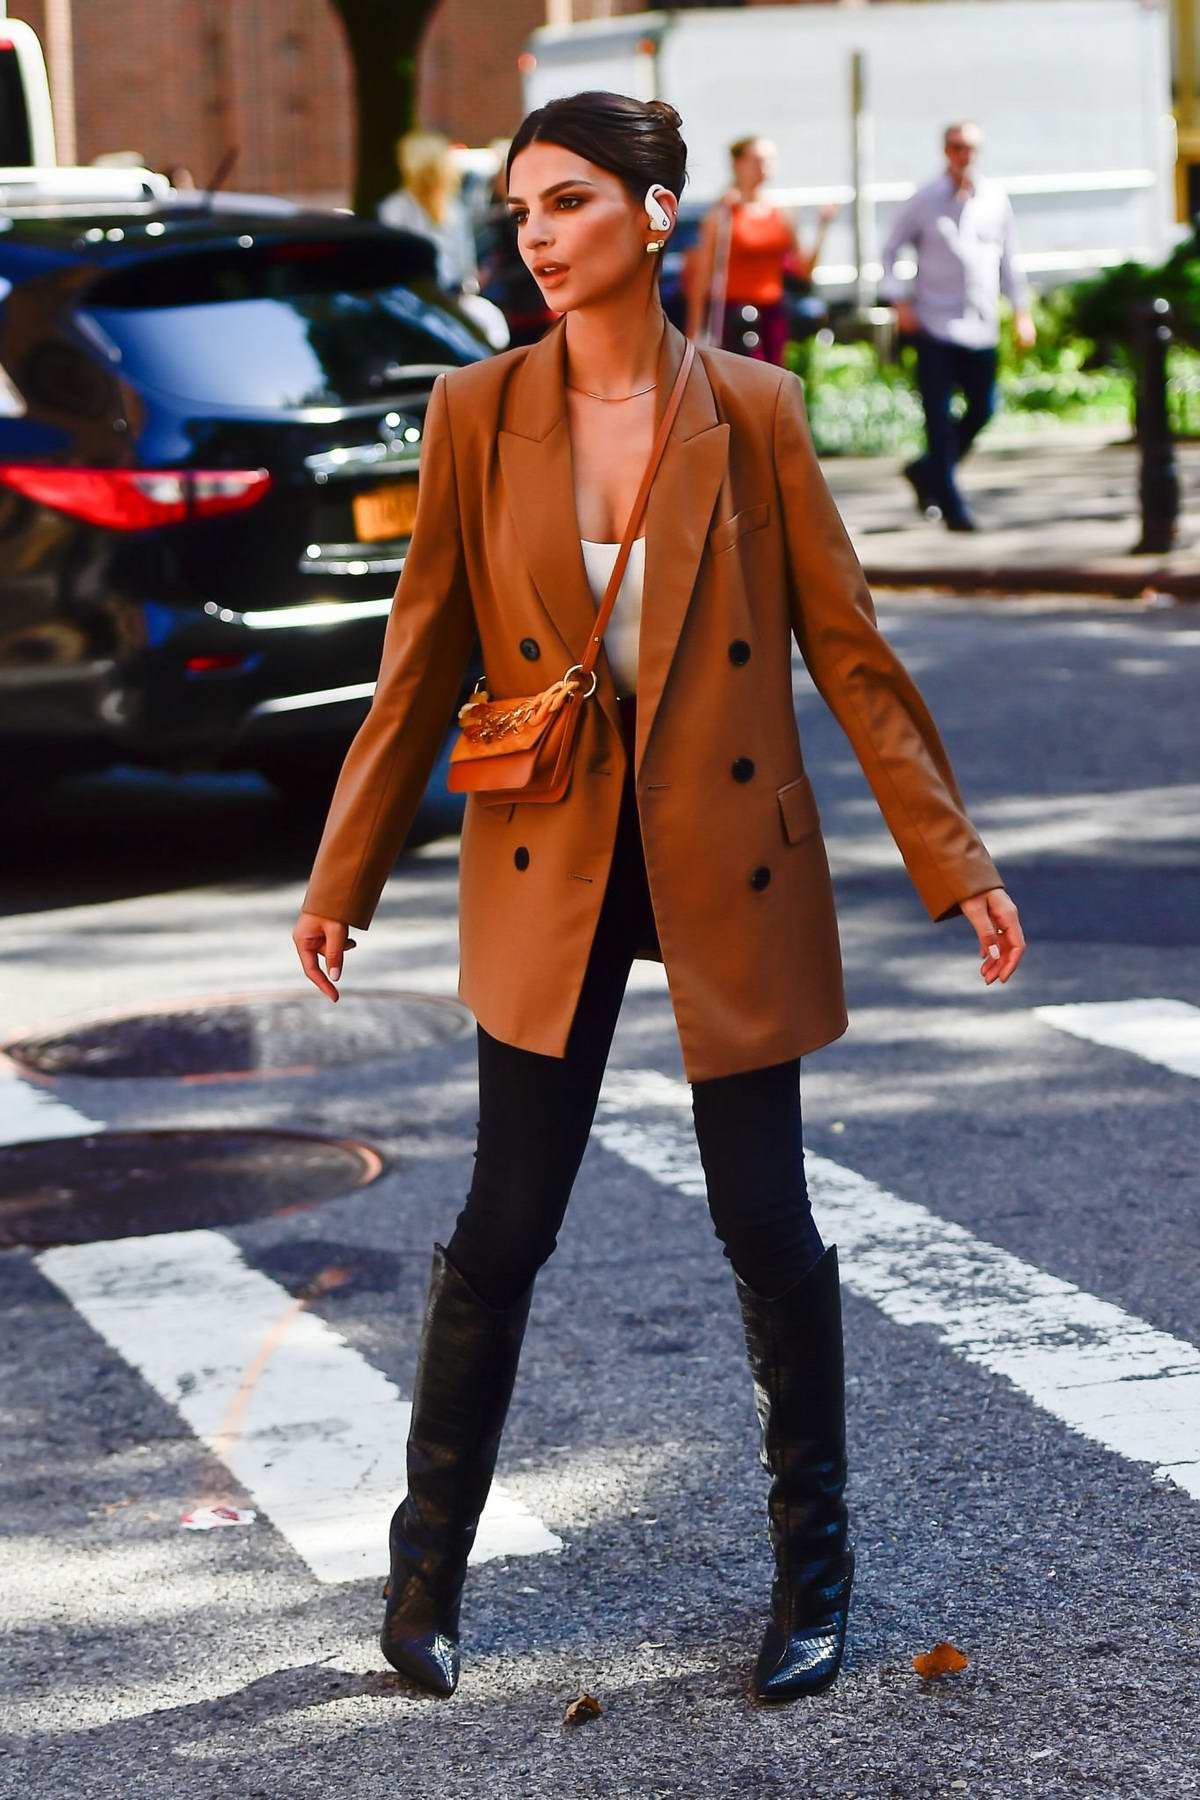 Emily Ratajkowski seen during a photoshoot for Beats headphones in New York City